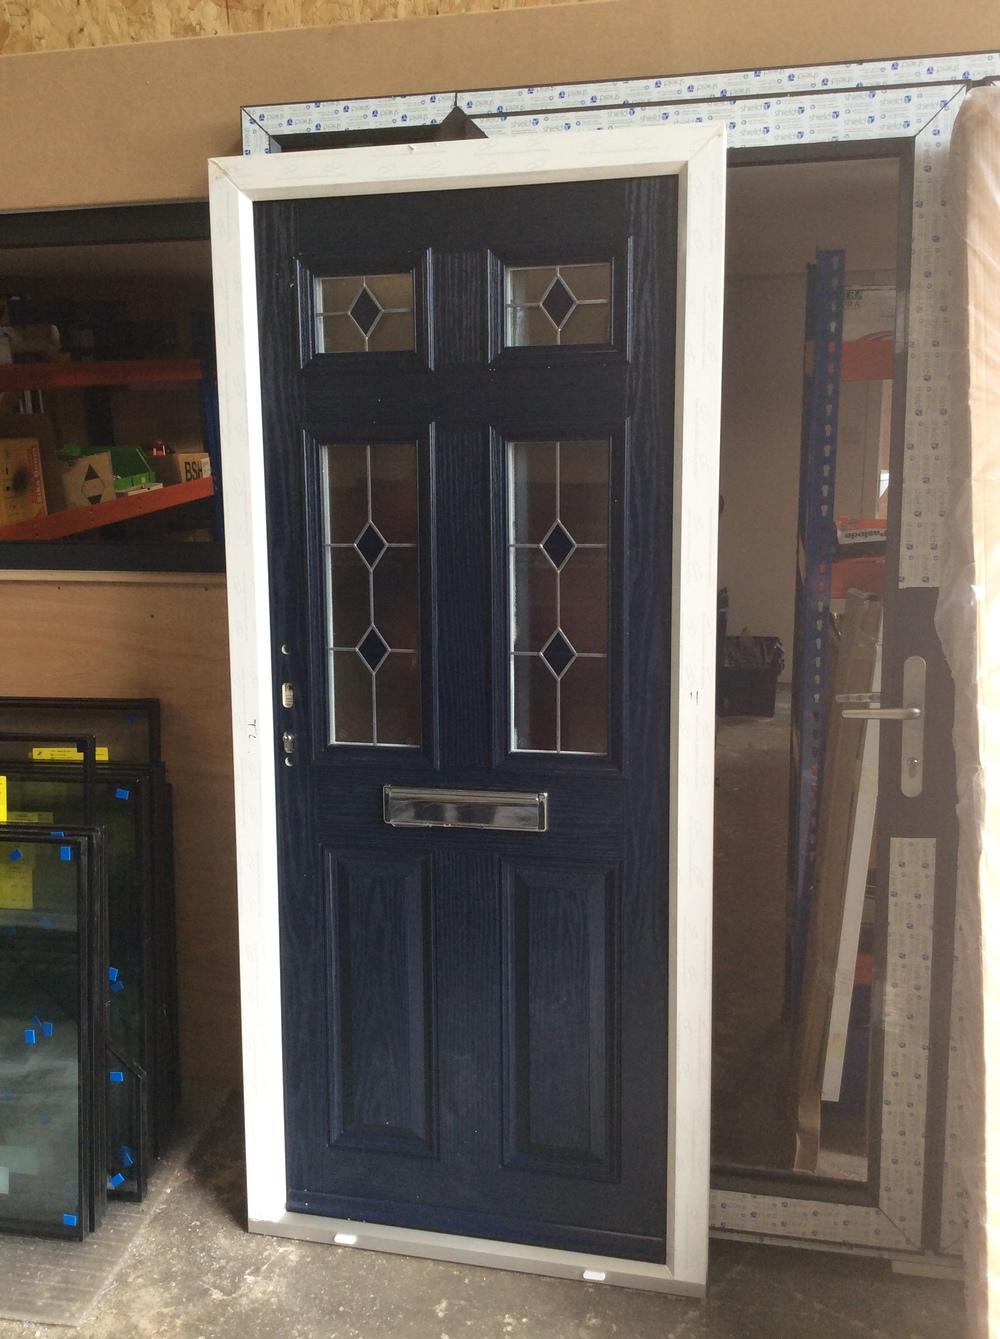 Double glazed composite door and frame 885 mm wide x 2010 mm high £500 + VAT